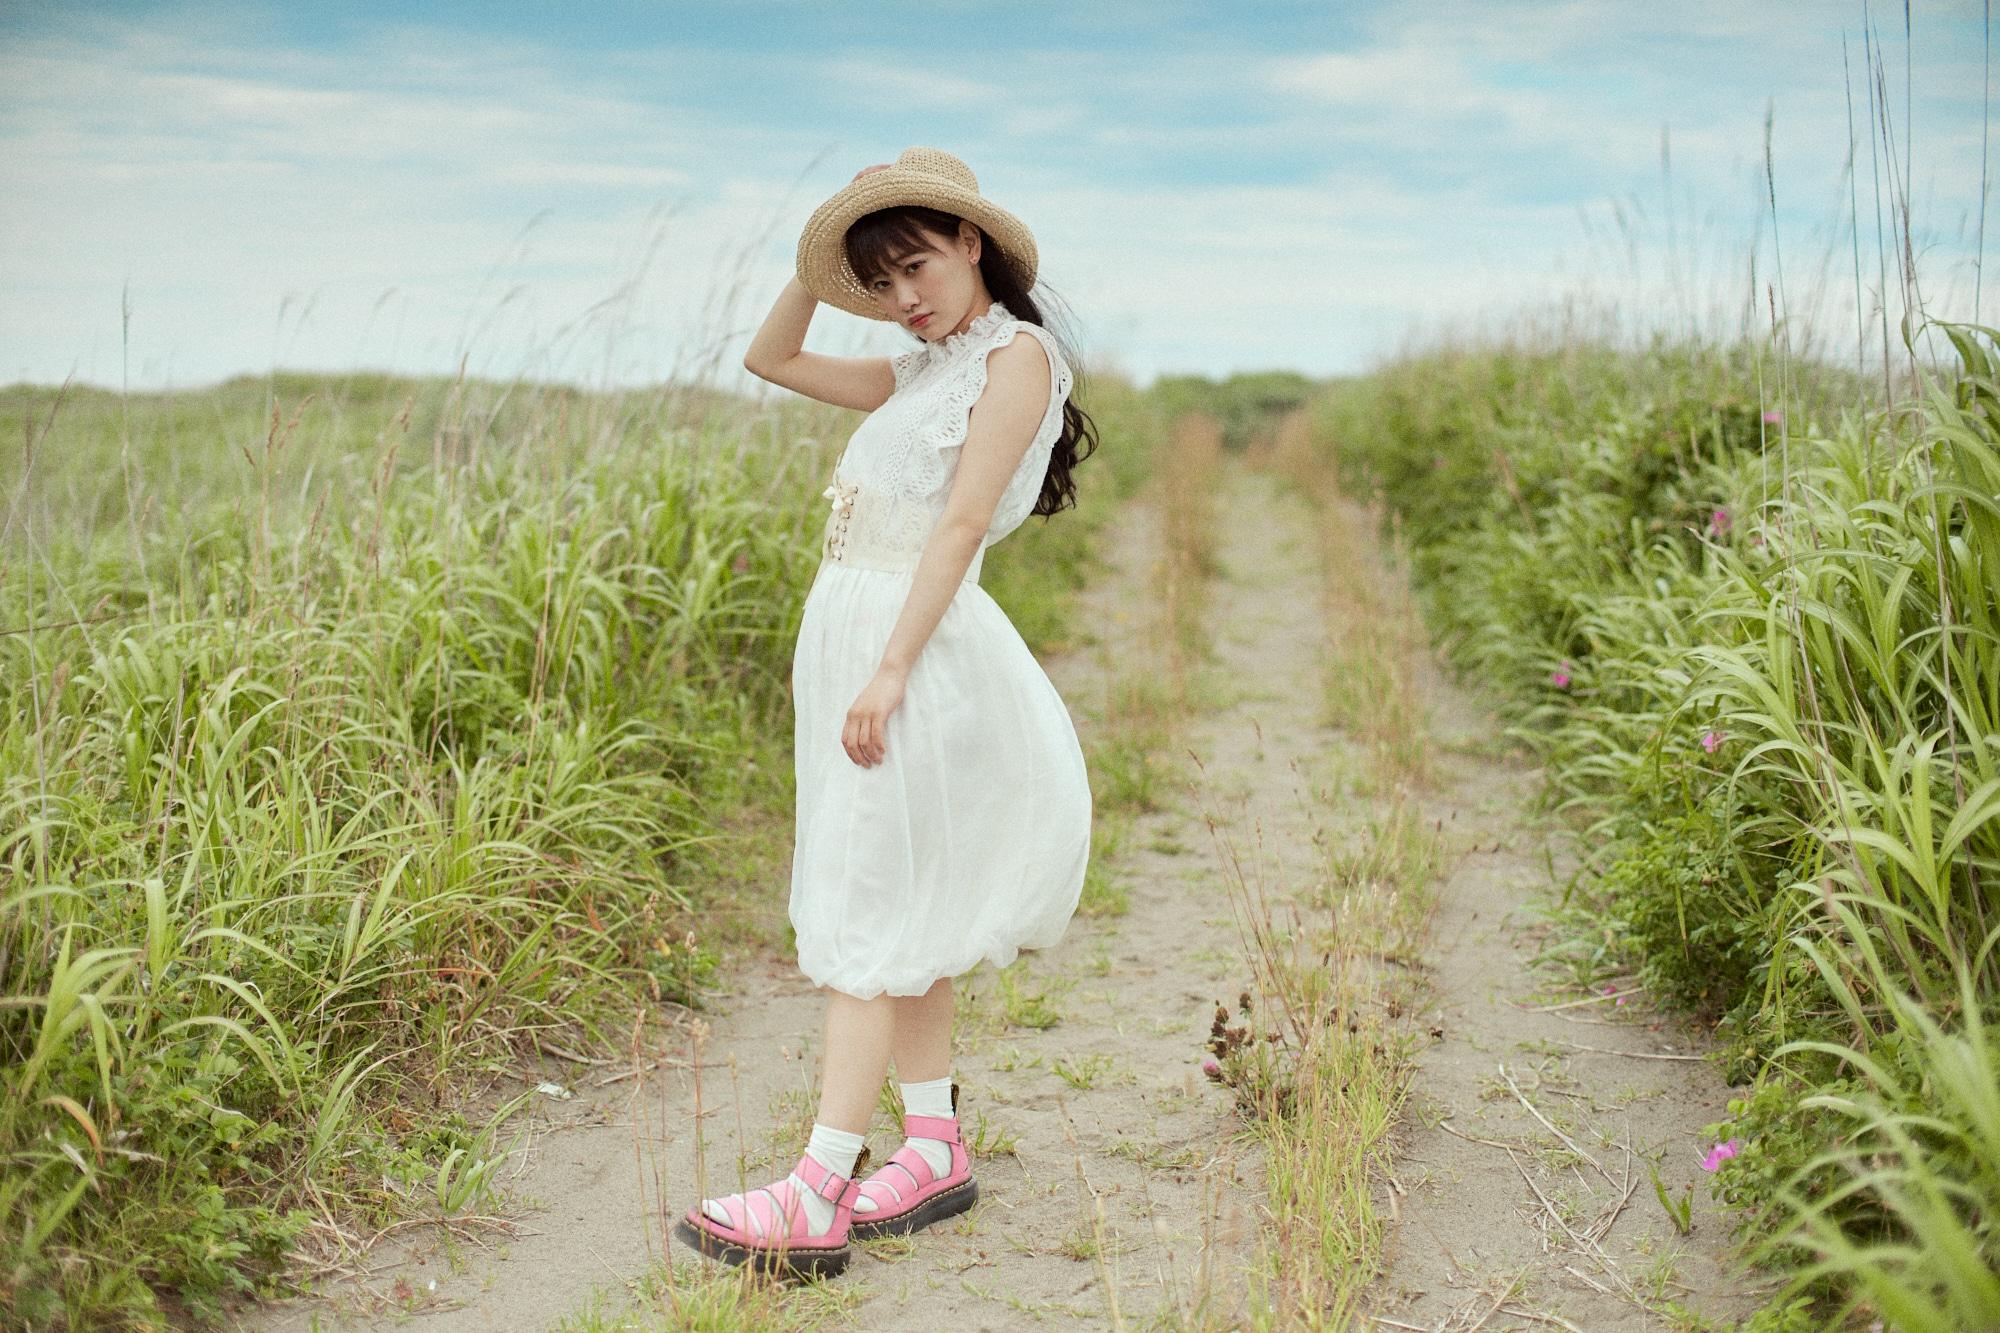 jphoto by jp9090vx